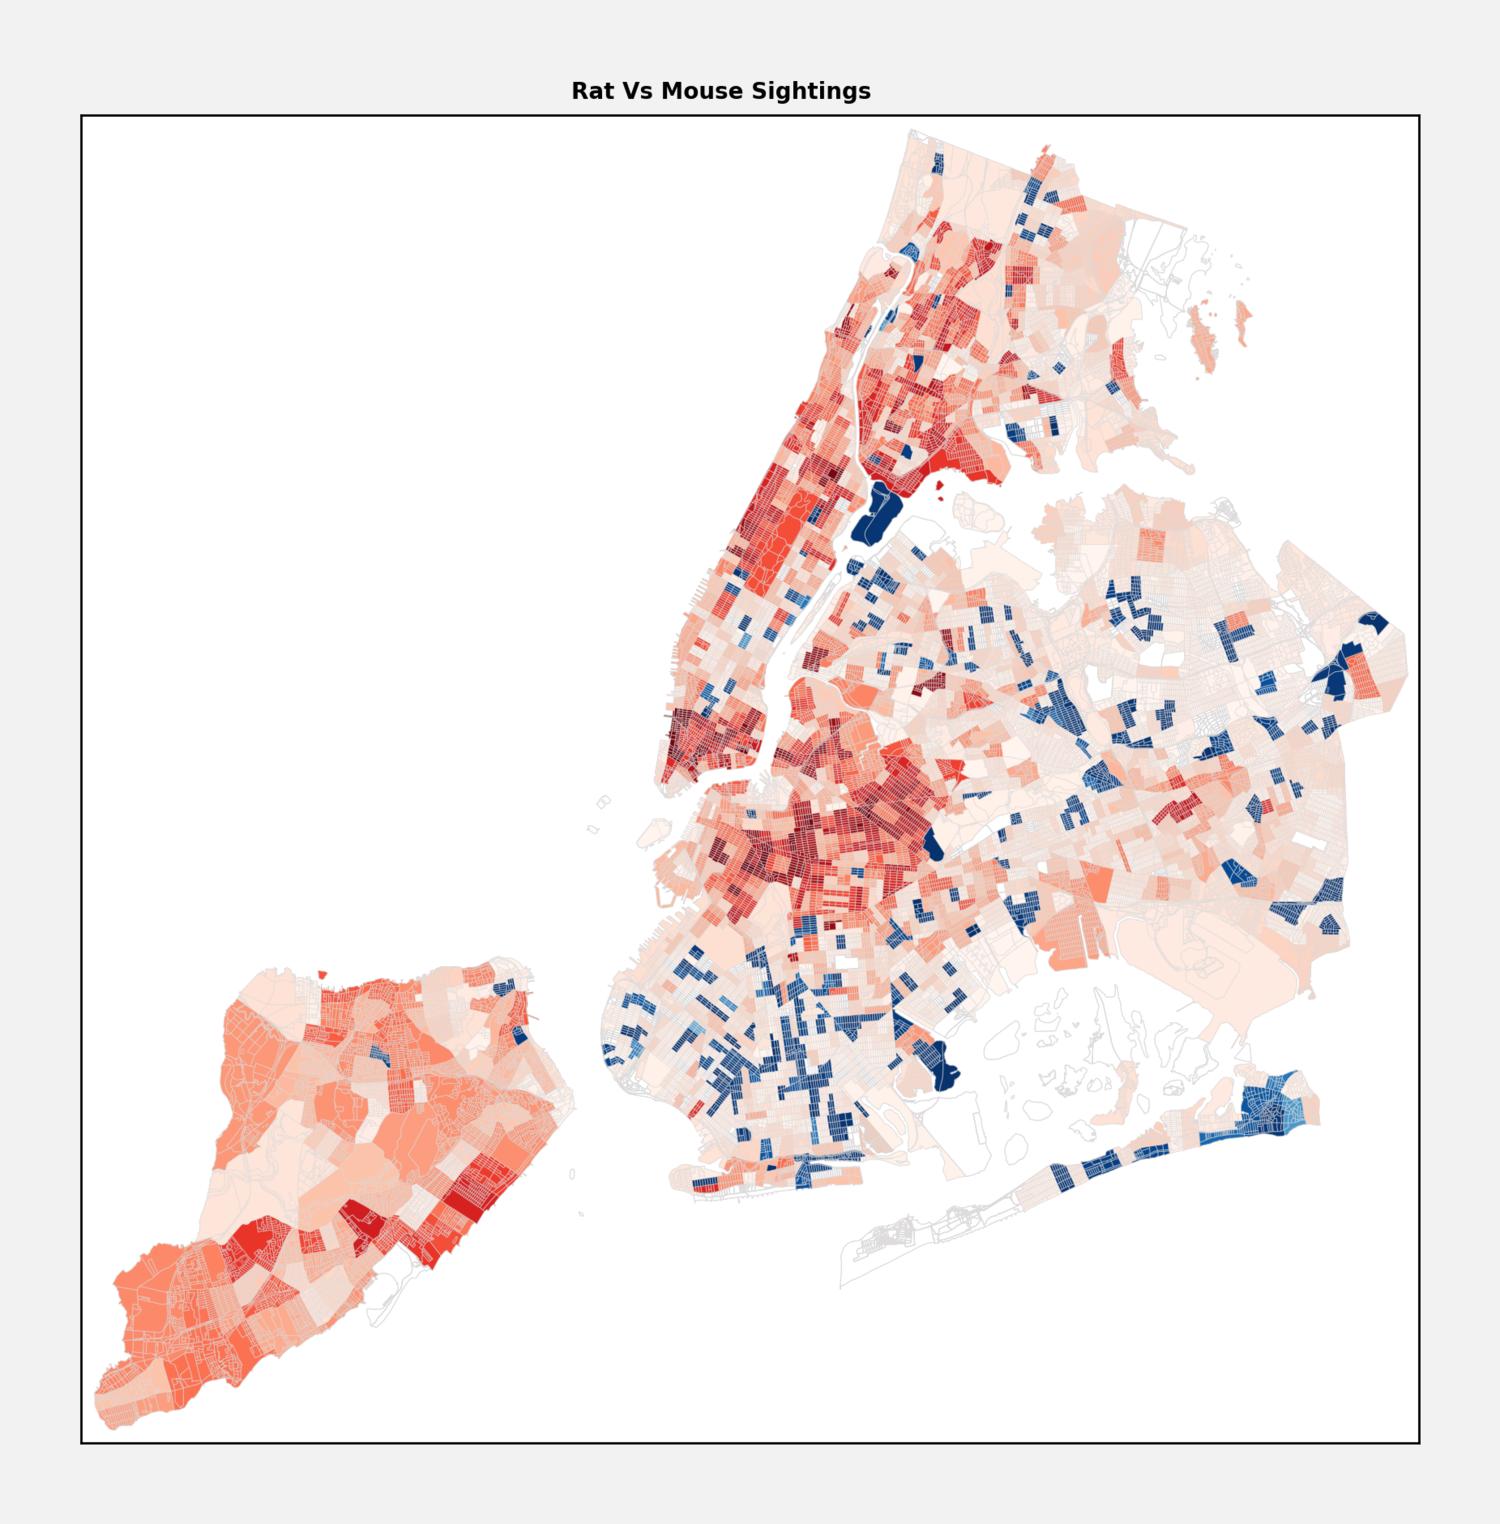 NYC Rat vs. Mice sightings